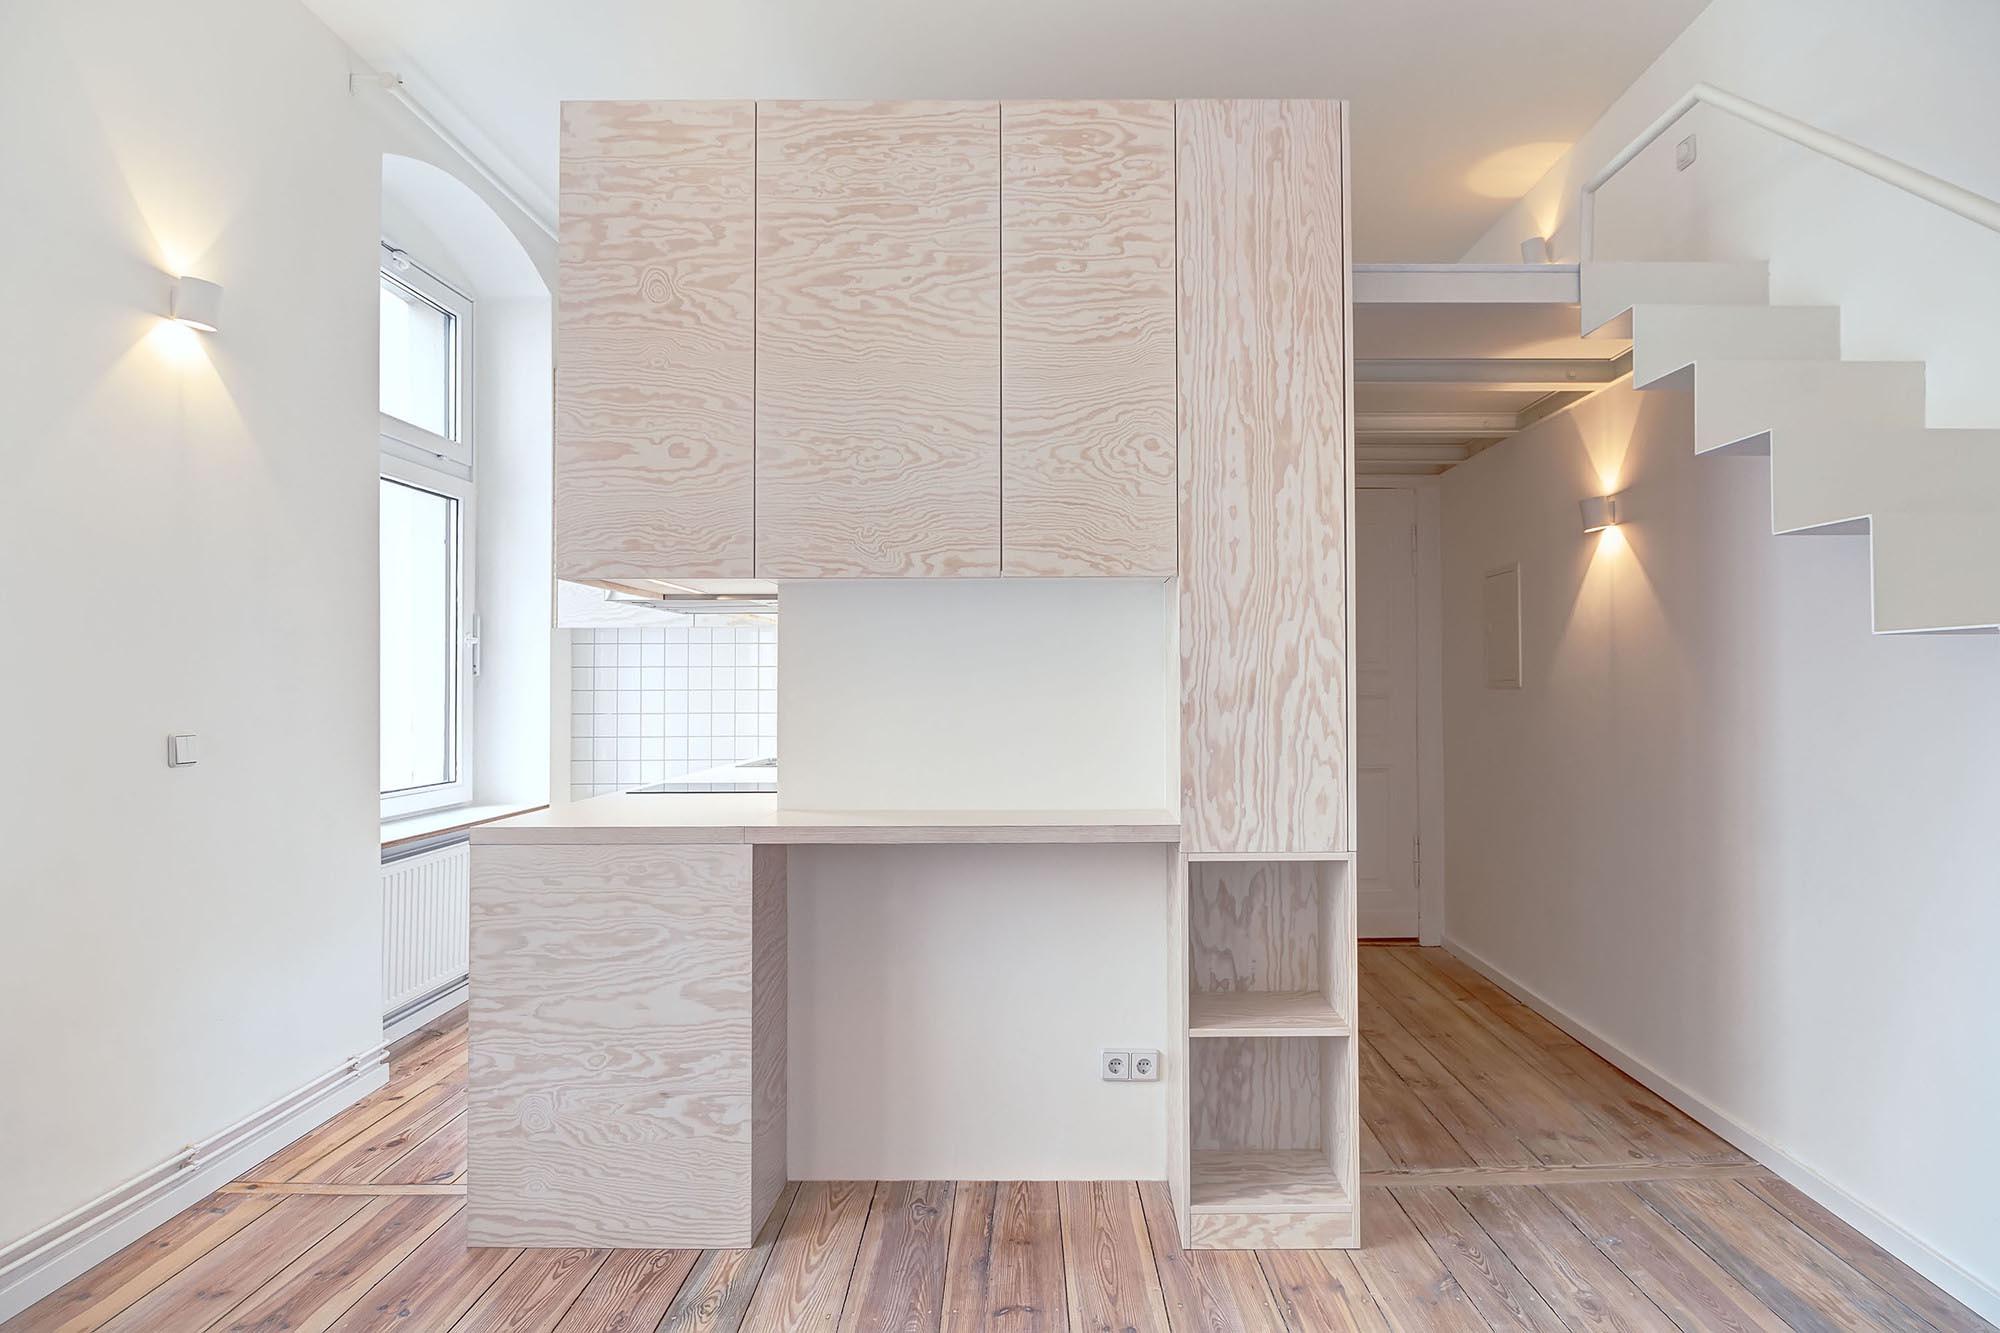 micro apartment in berlin Micro apartment in Berlin